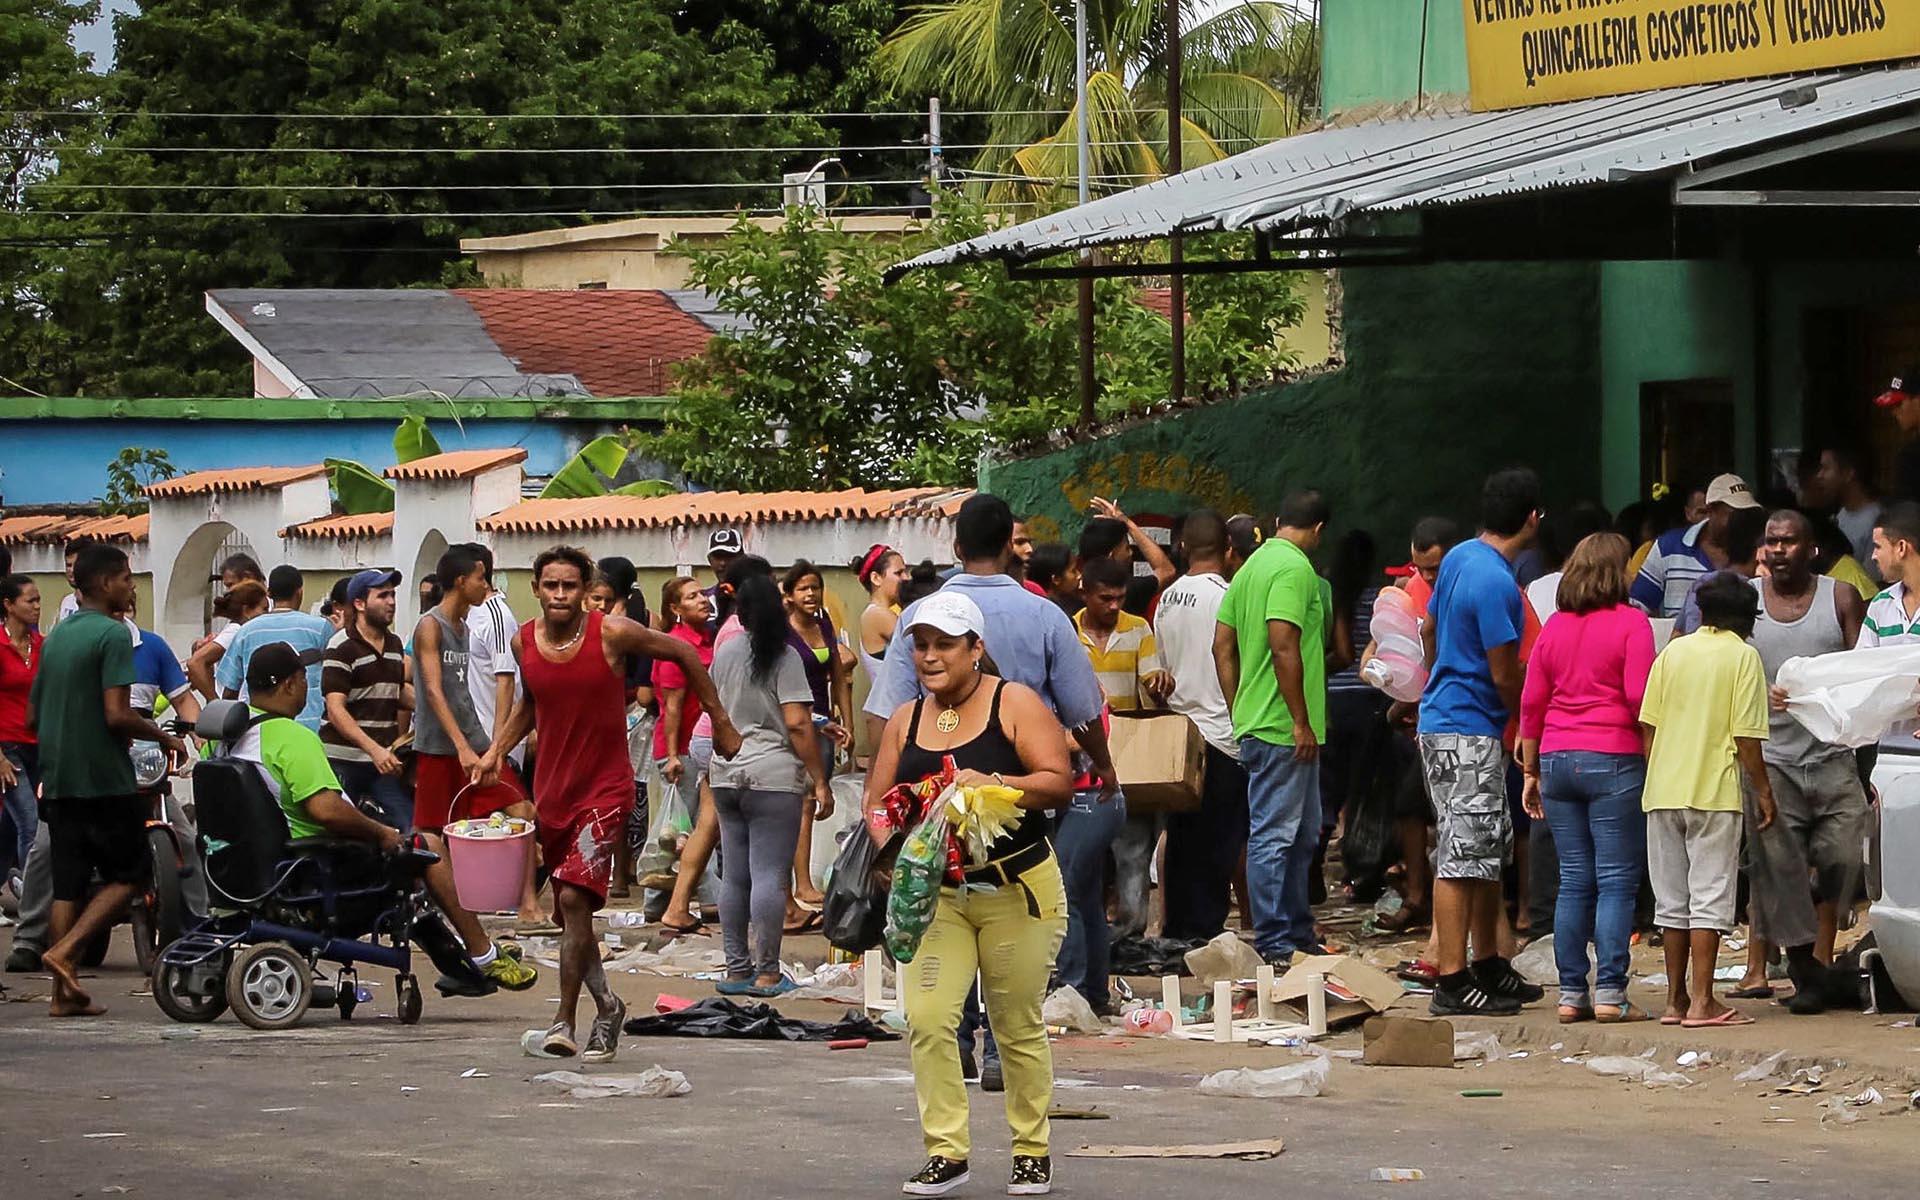 Starving Venezuelans Turn to Bitcoin Mining in Desperation